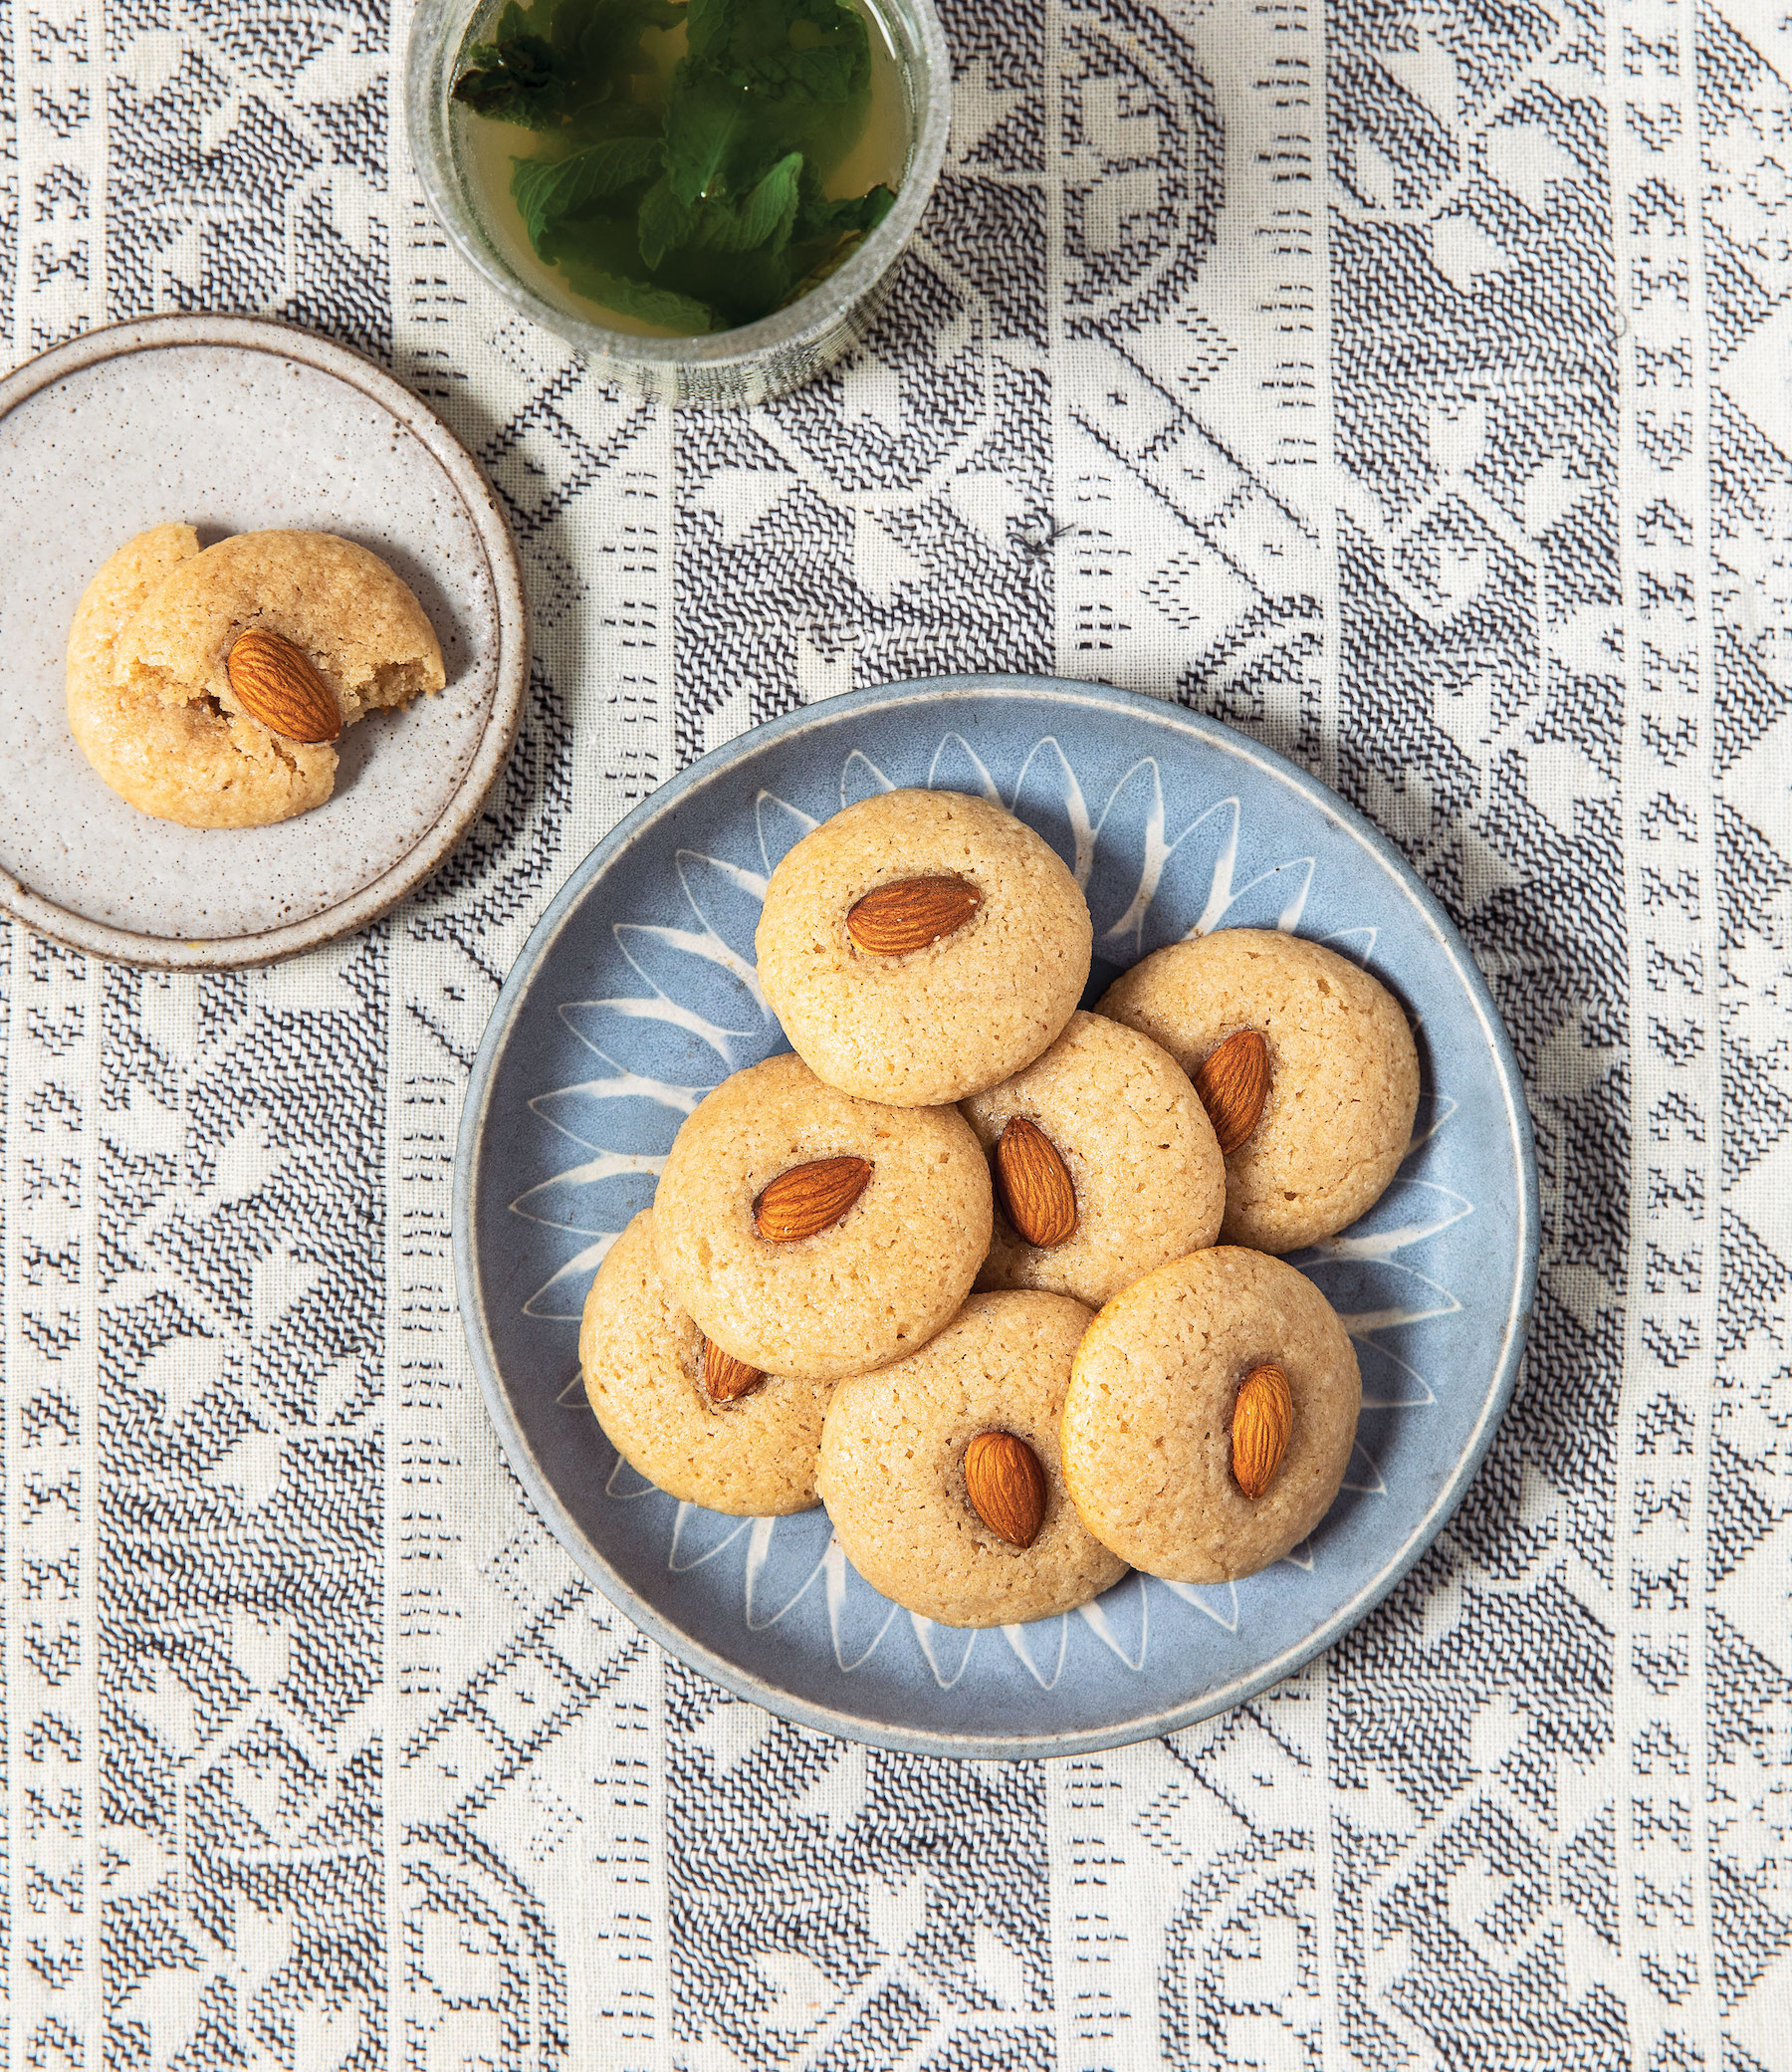 Chewy Iraqi Almond Cookies (Hadji Bada)